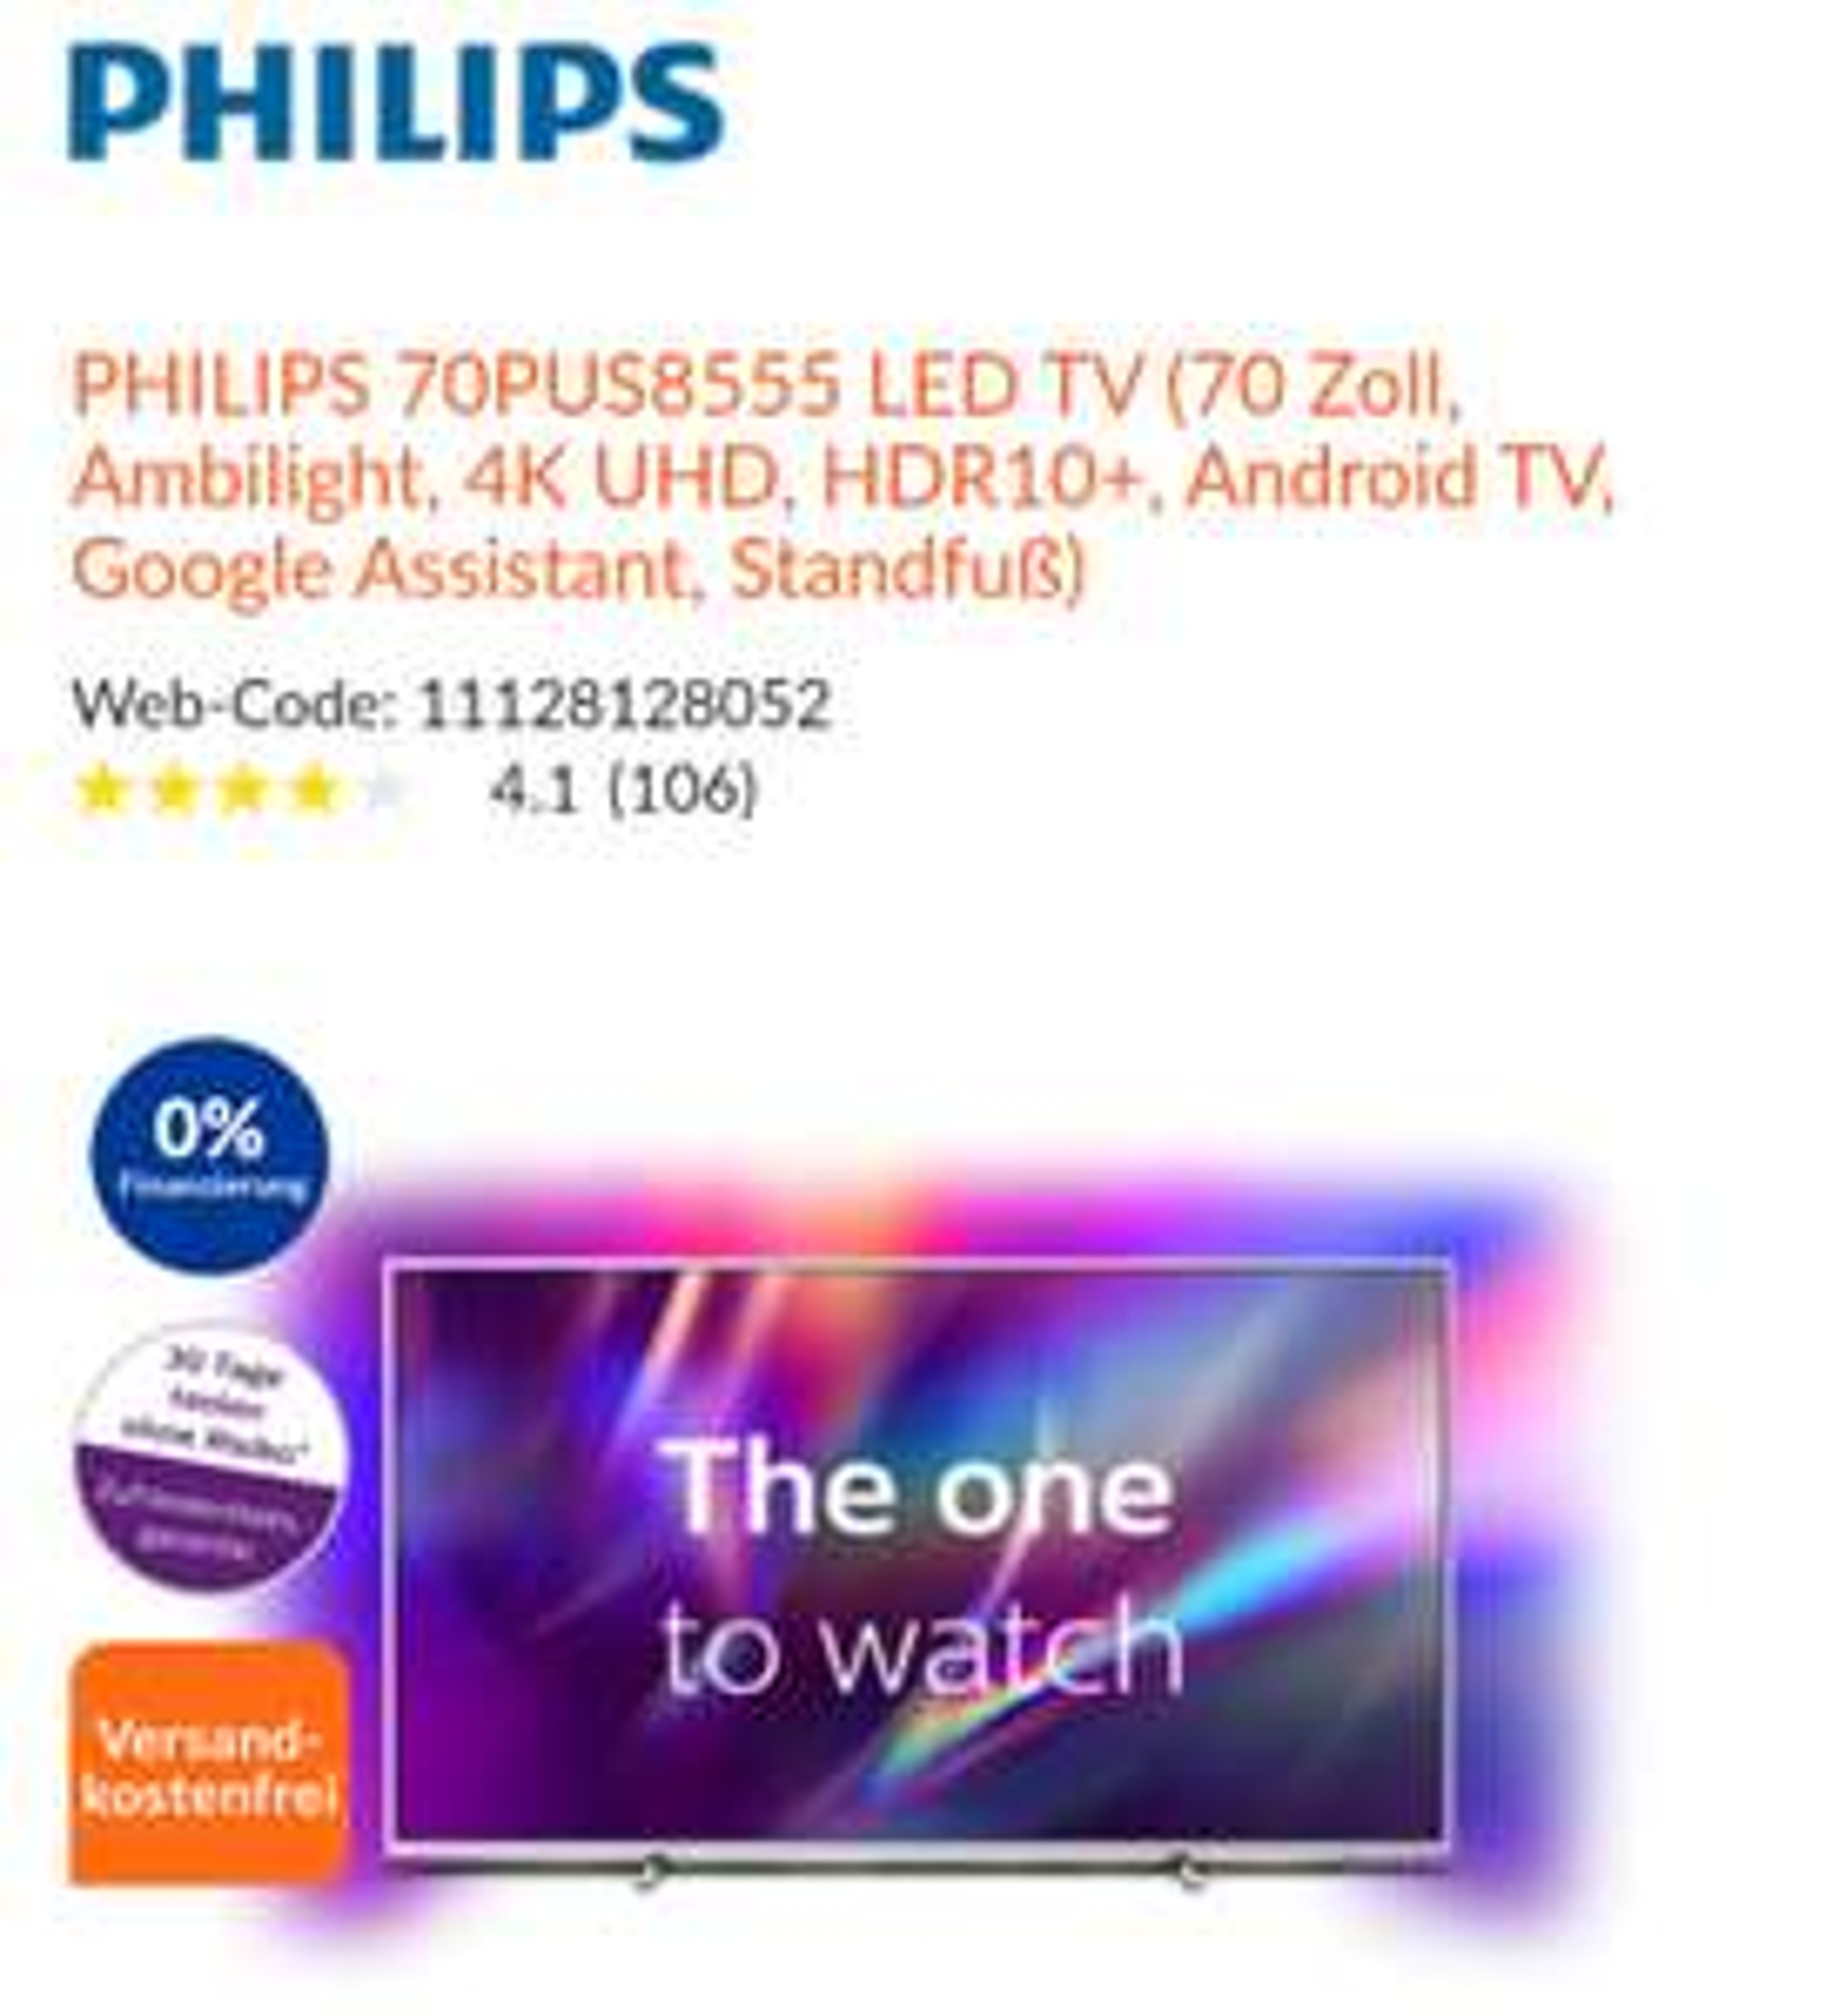 Philips 70 PUS 8555 (Expert Euskirchen)